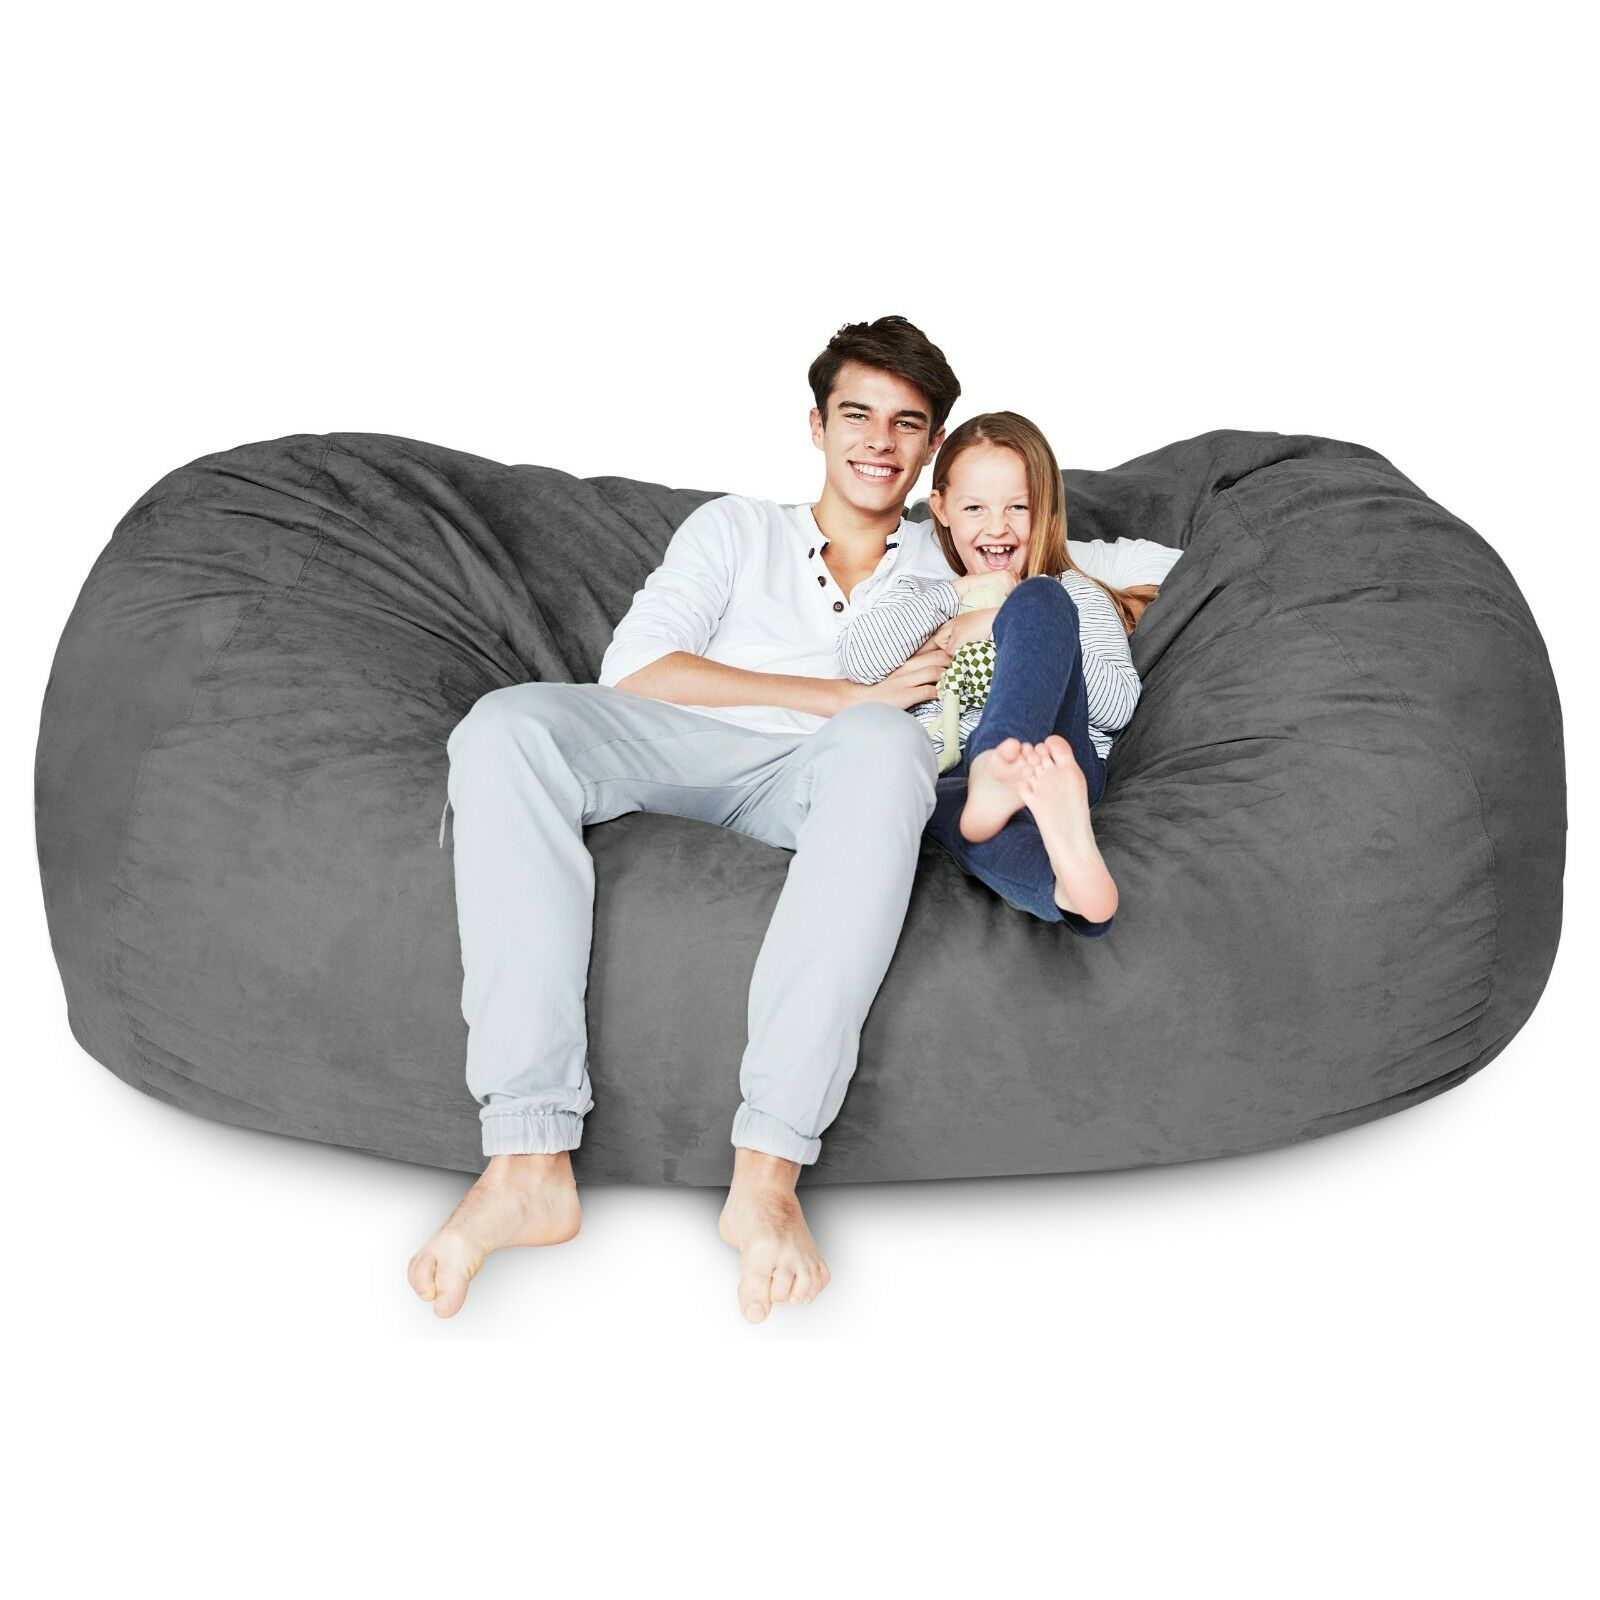 Phenomenal Foam Filled Giant Xxl Bean Bag Chair Big Sofa Relax Seat Lounger Loveseat Couch Uwap Interior Chair Design Uwaporg